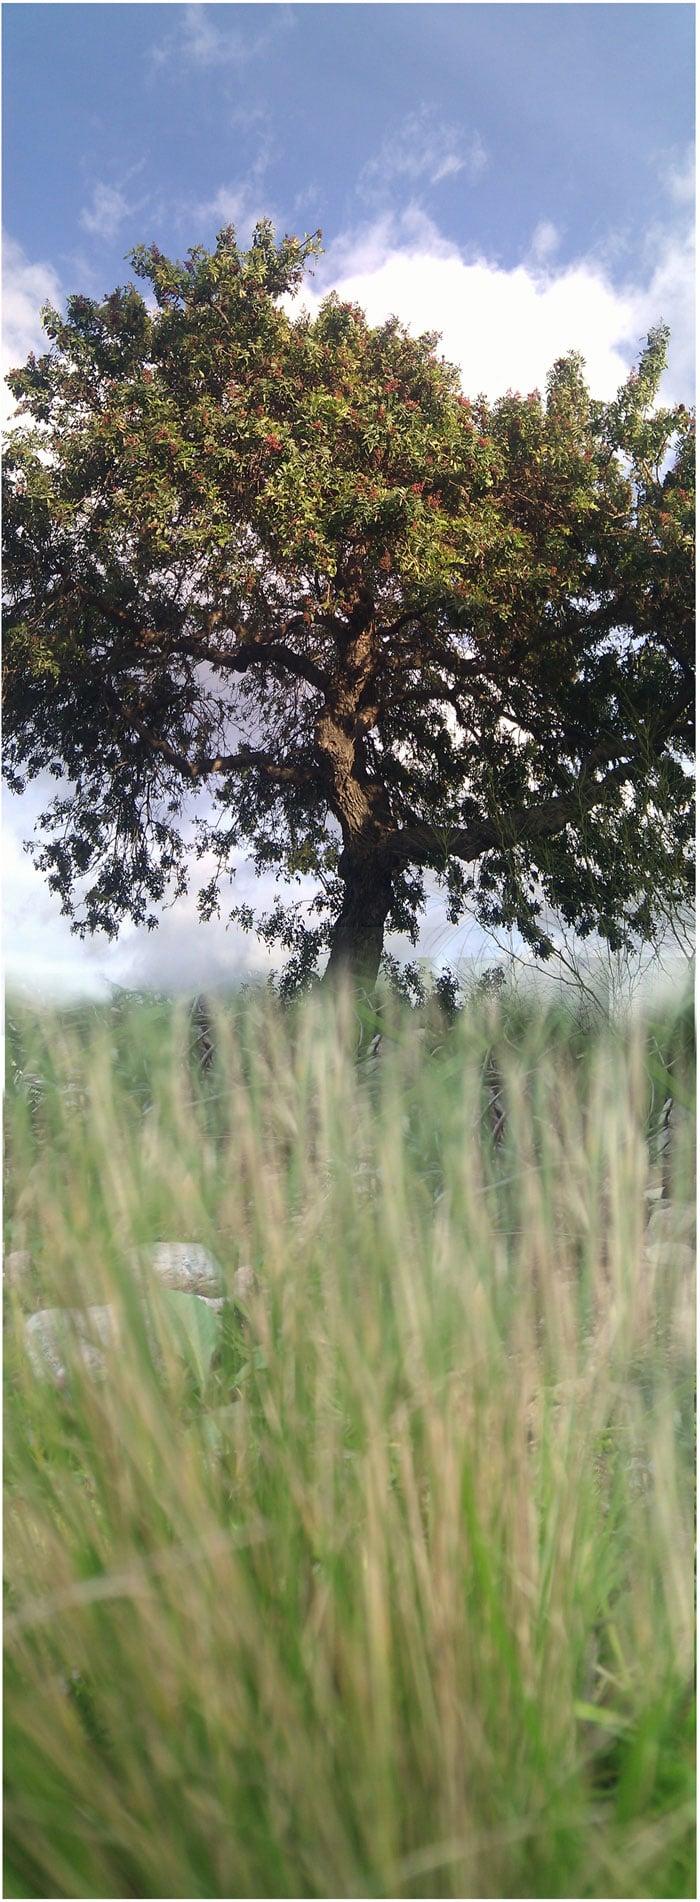 tree-in-the-garden(web)